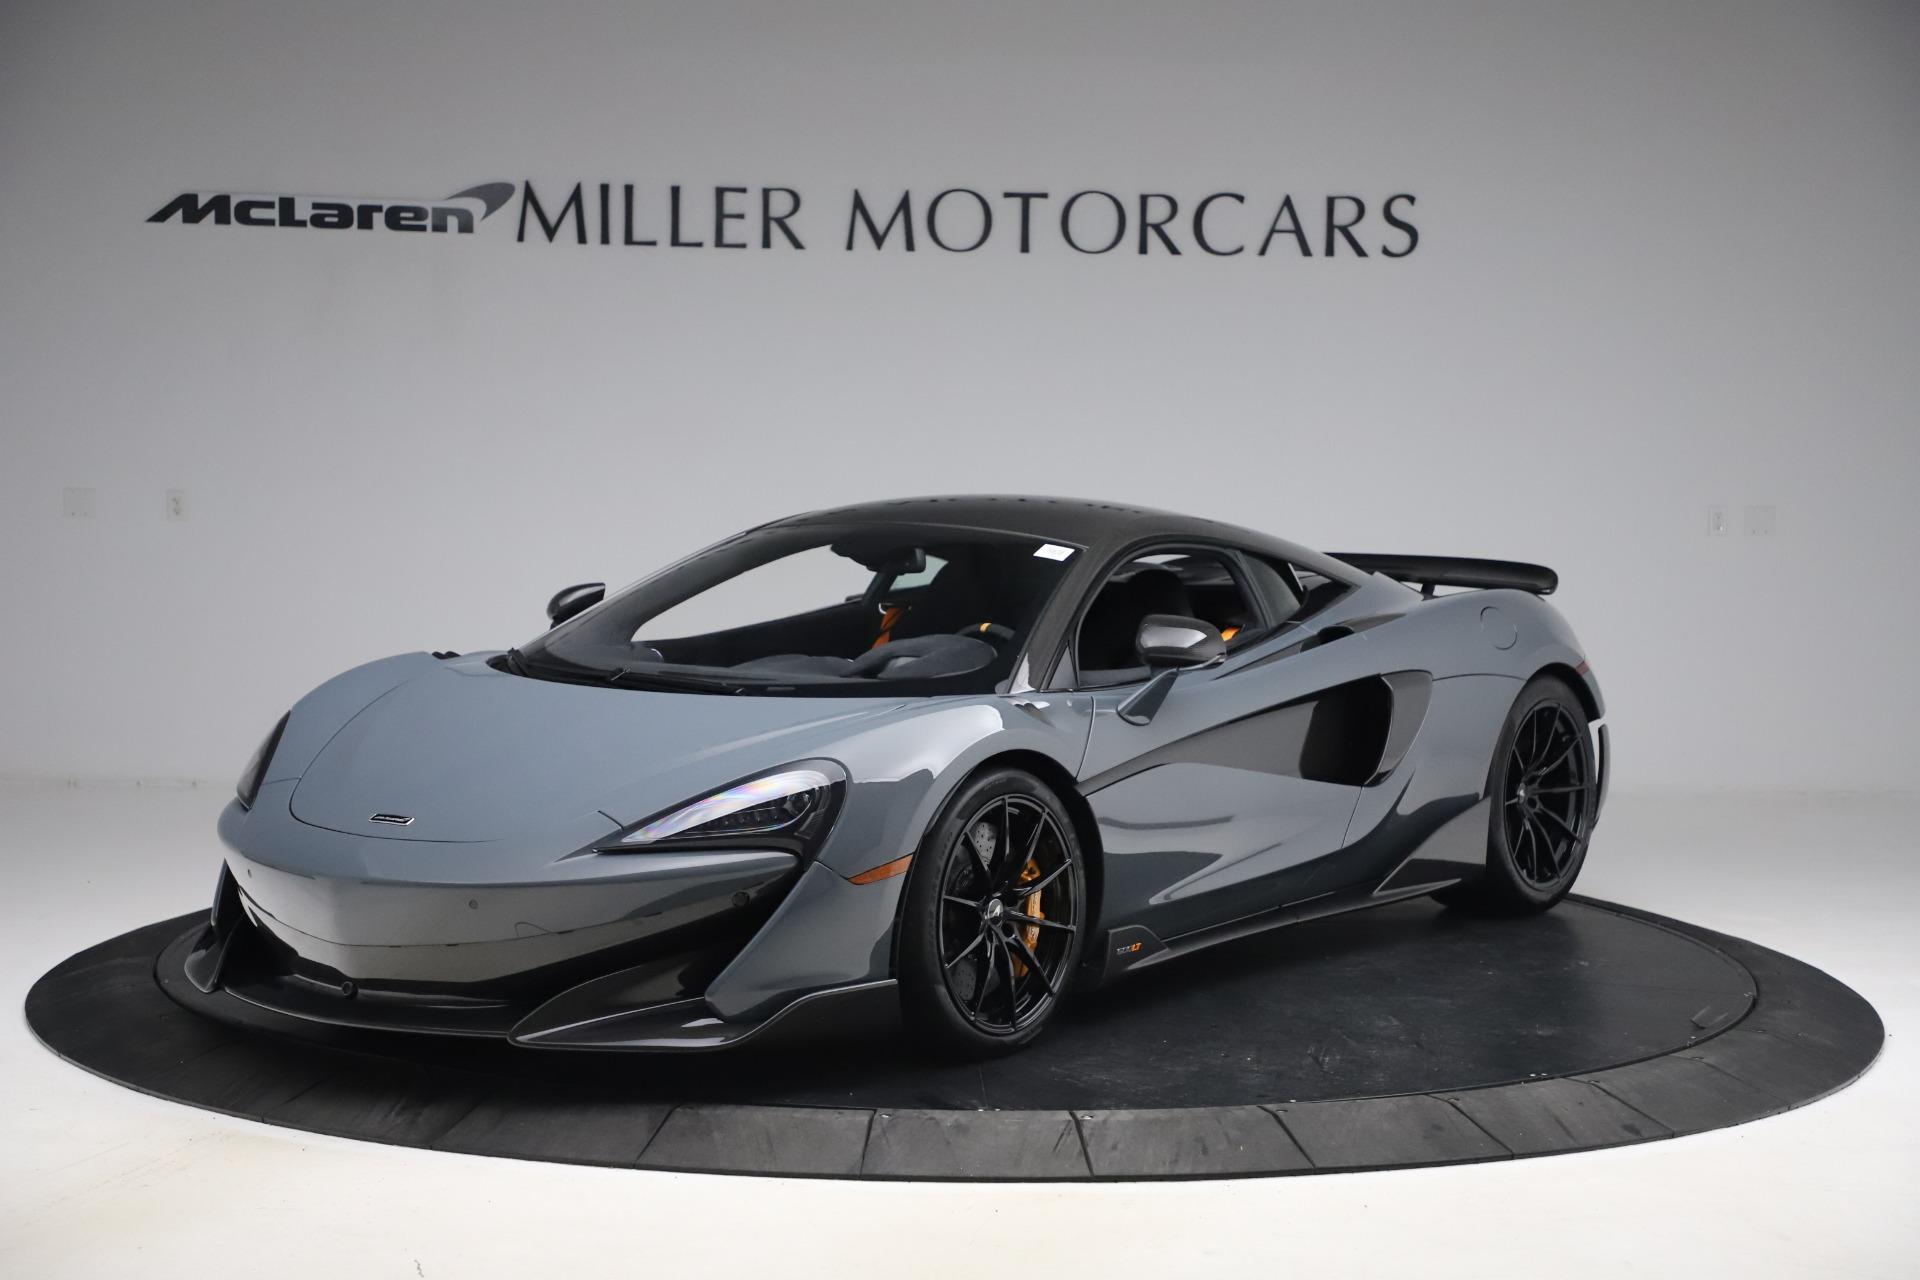 Used 2019 McLaren 600LT Coupe for sale $229,900 at Alfa Romeo of Westport in Westport CT 06880 1